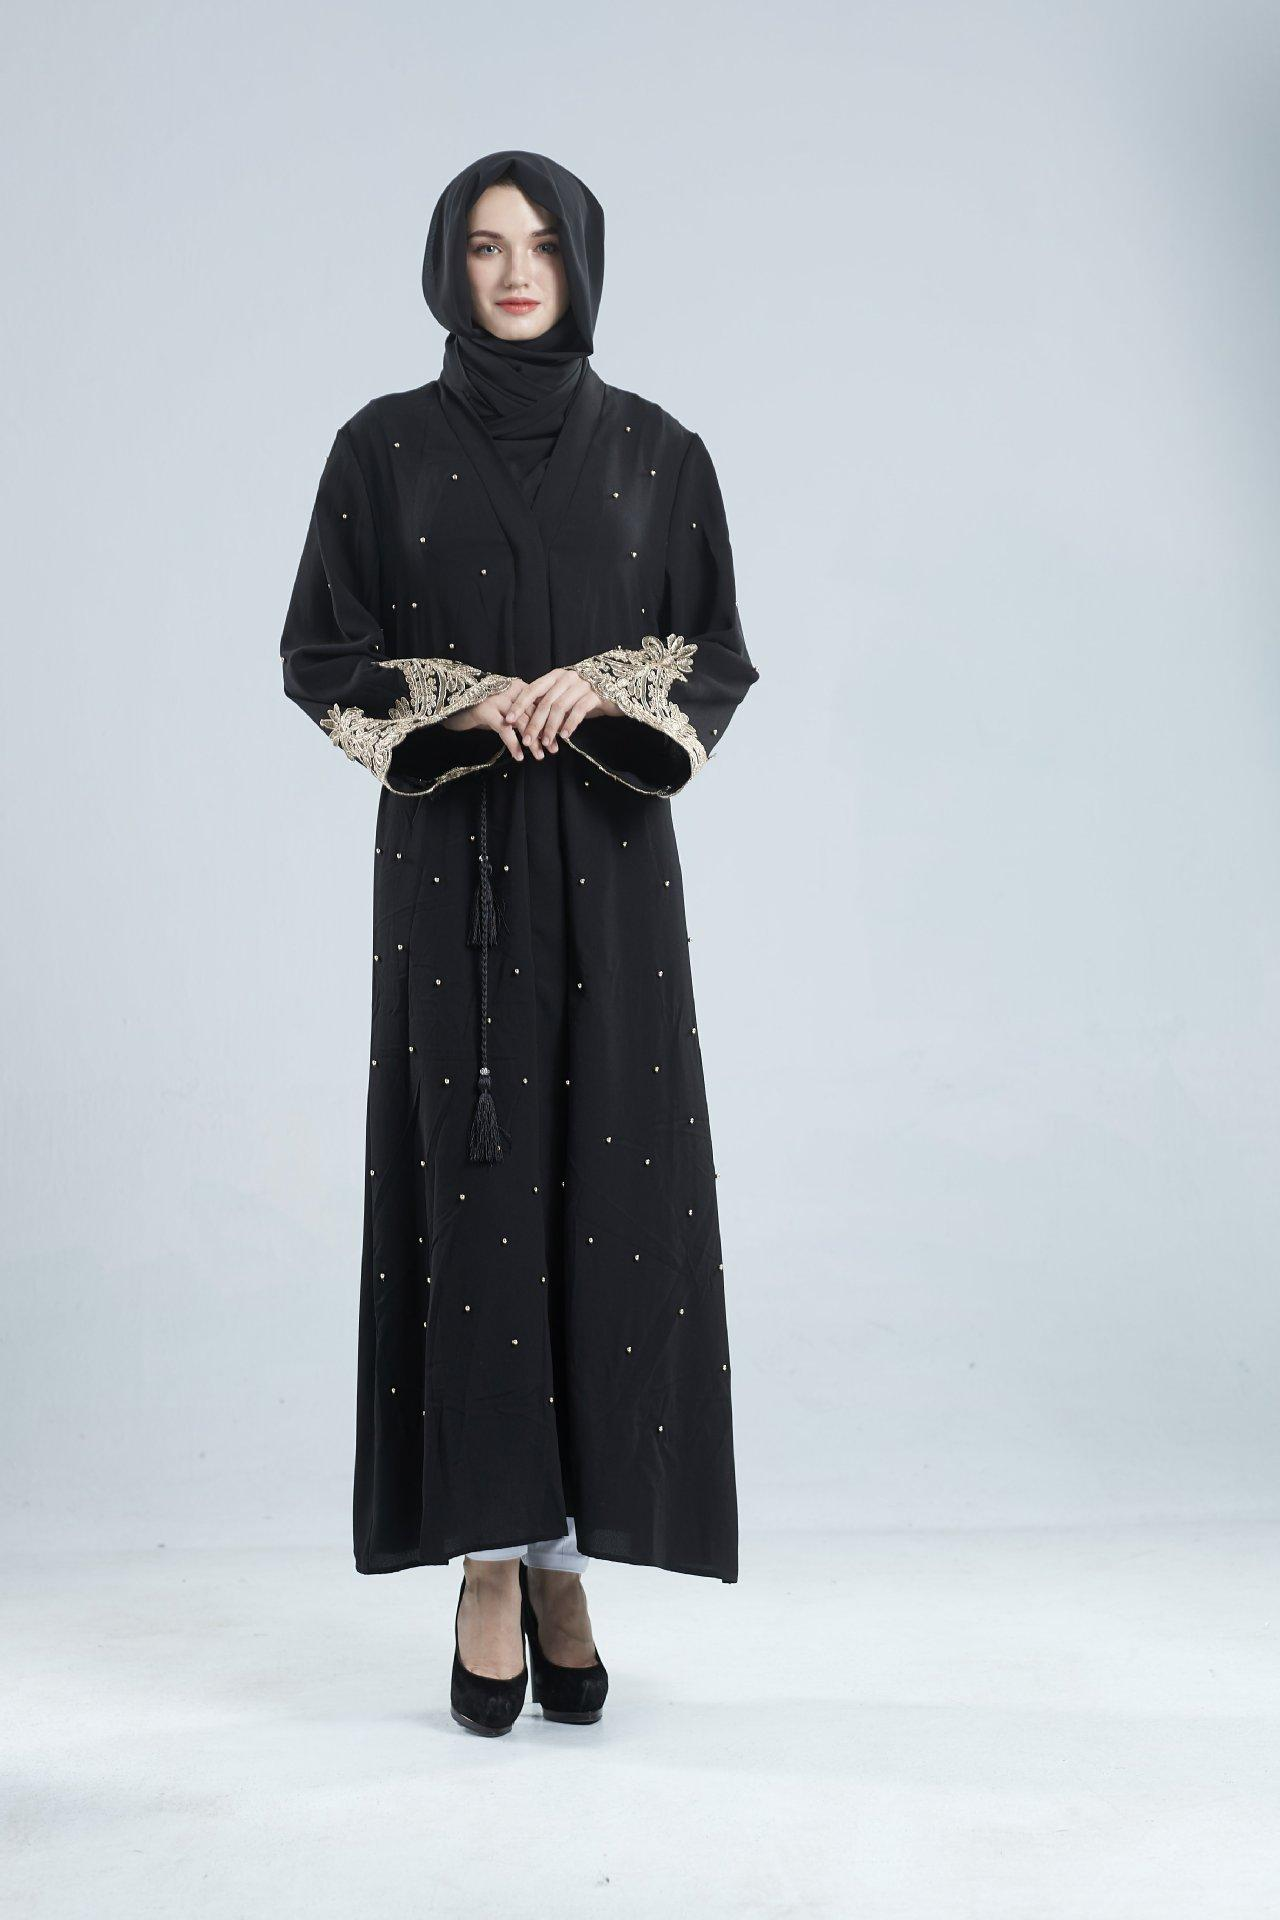 4965d85717 Latest LumiParty shop-dresses-jumpsuits Products | Enjoy Huge ...